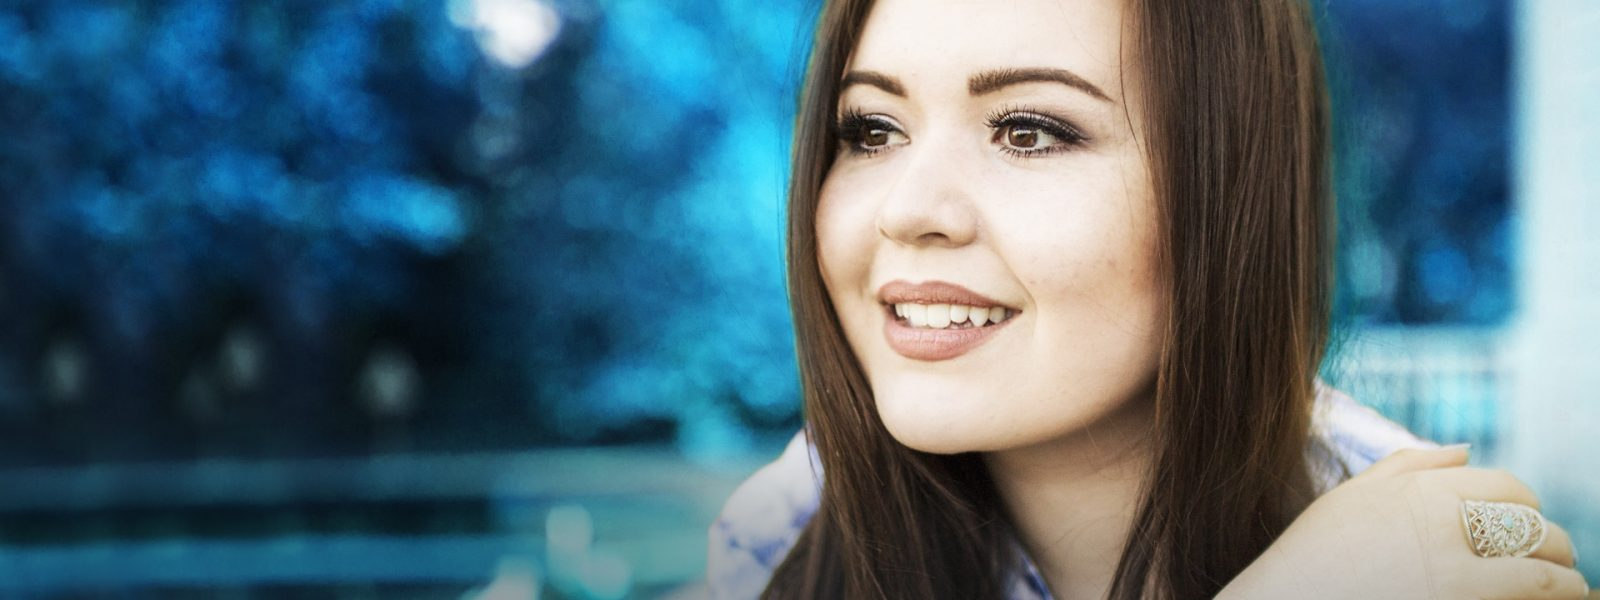 Konsertti: On hetki – Diandra